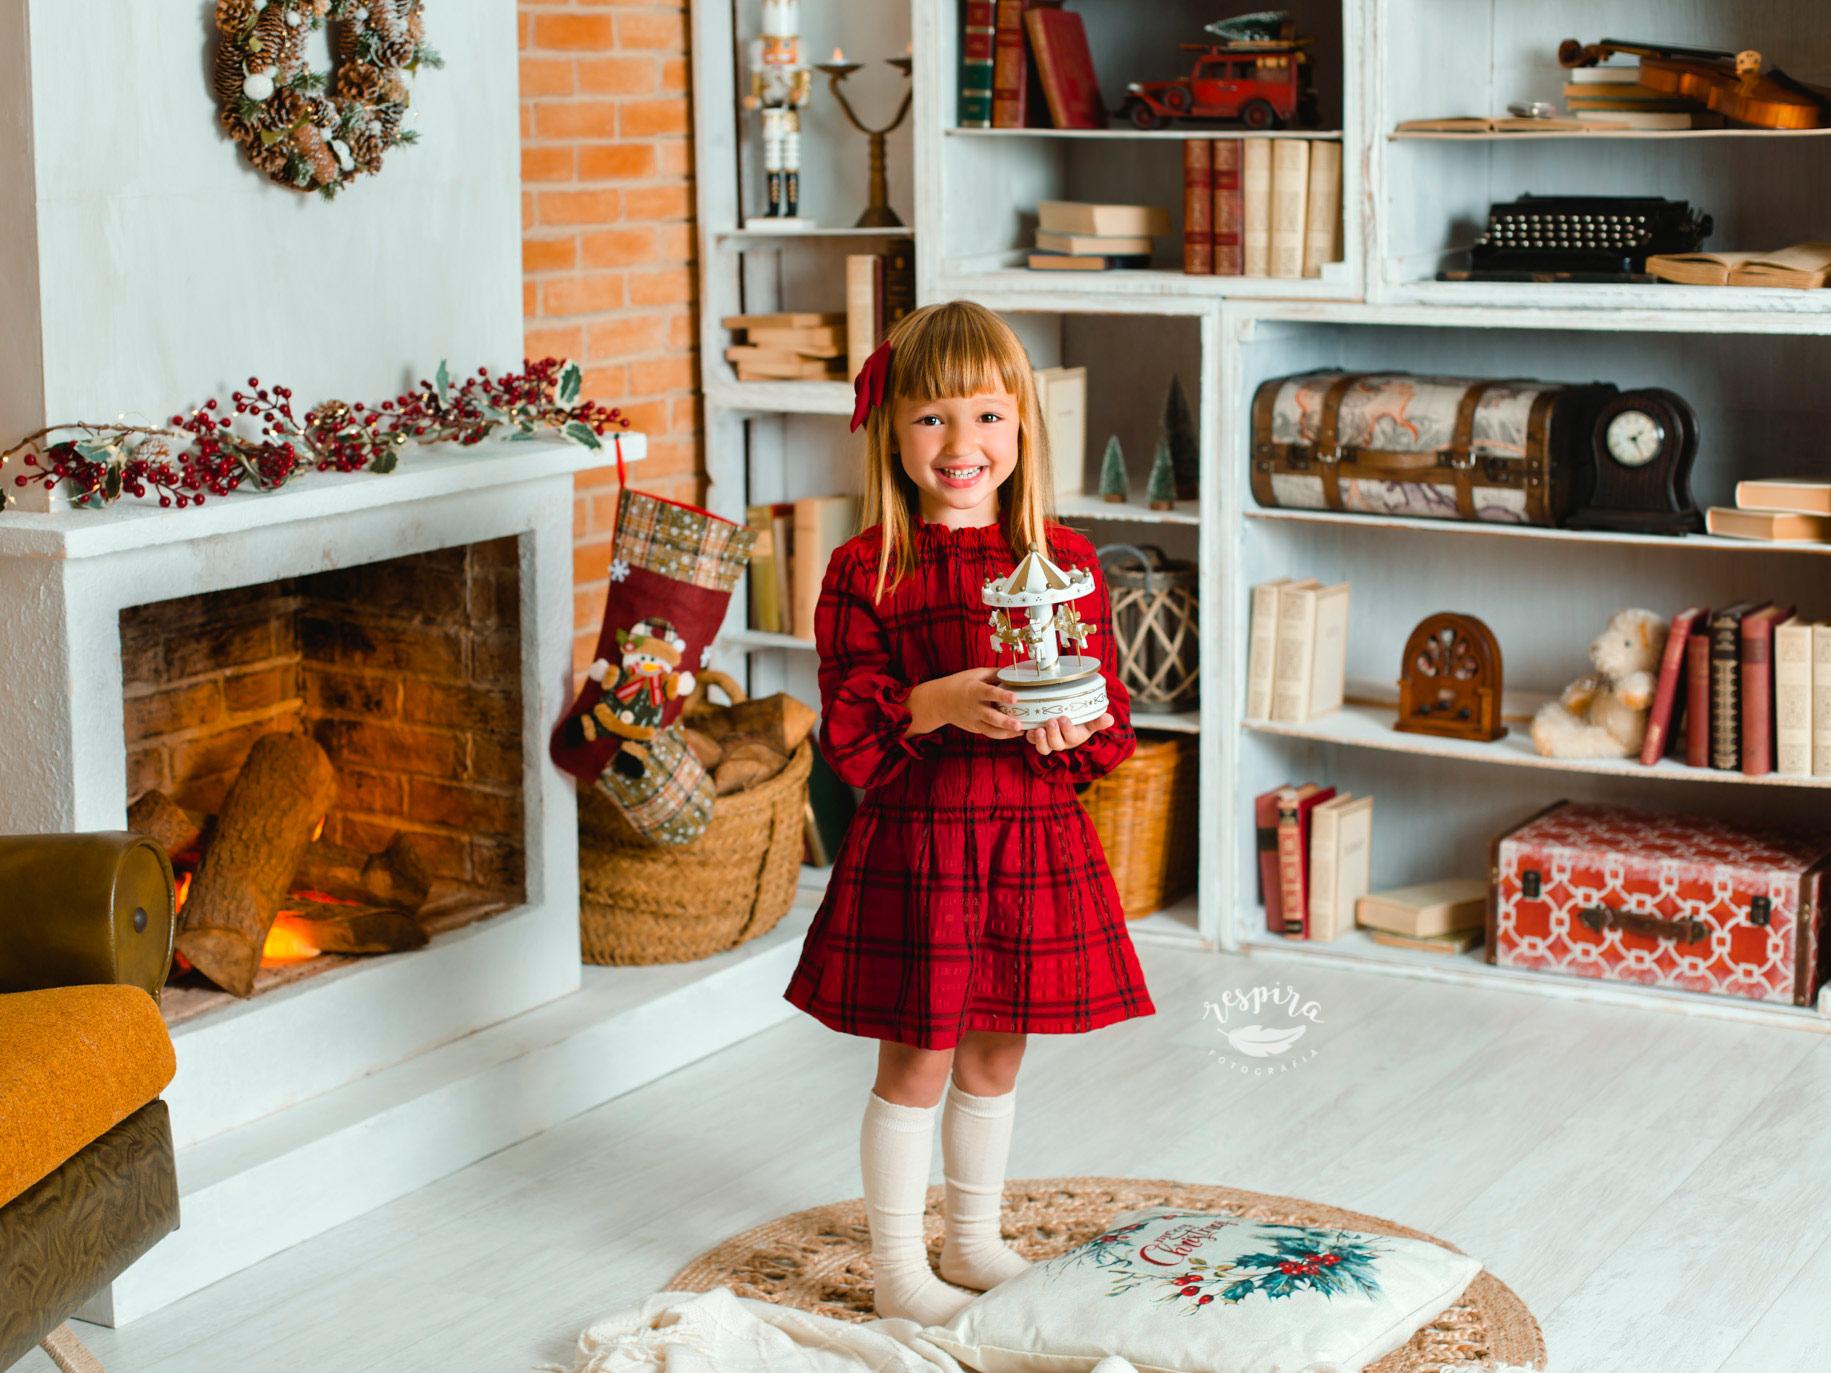 Sessio nadal nens olesa collbato bruc esparreguera monistrol